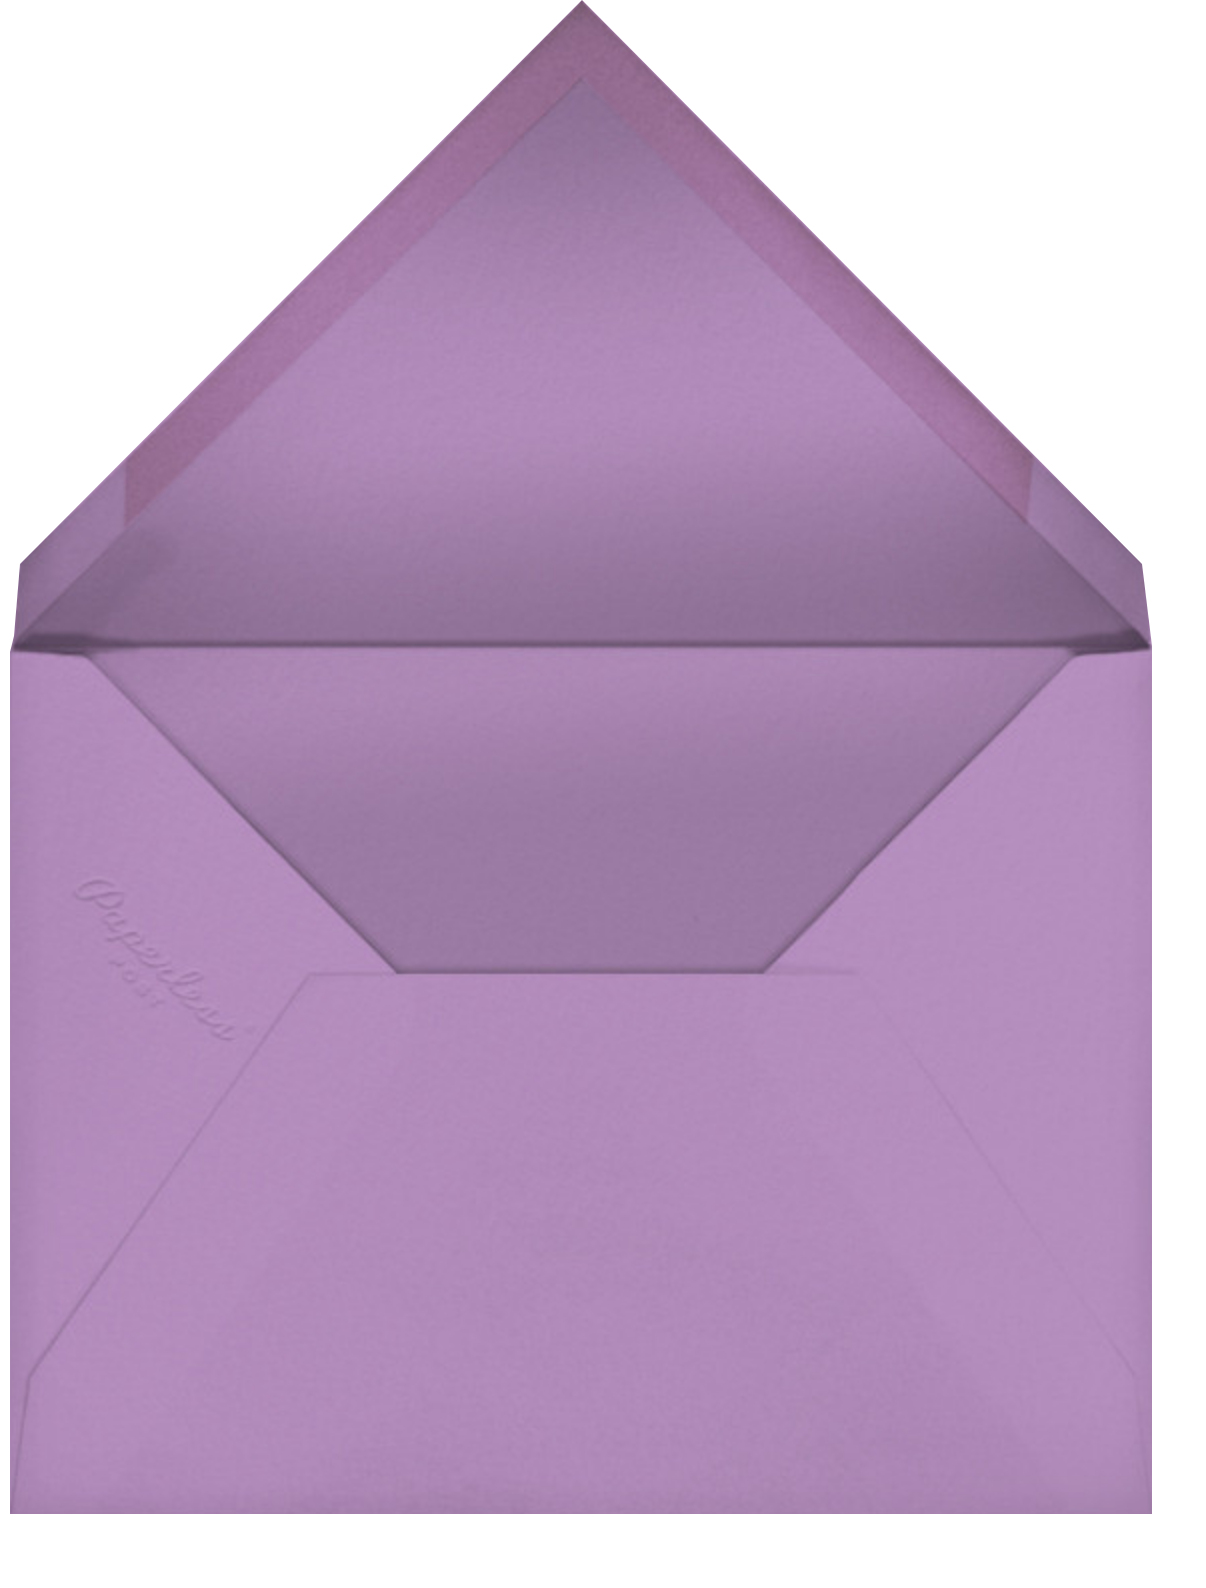 Crete (Light Purple) - Paperless Post - Envelope